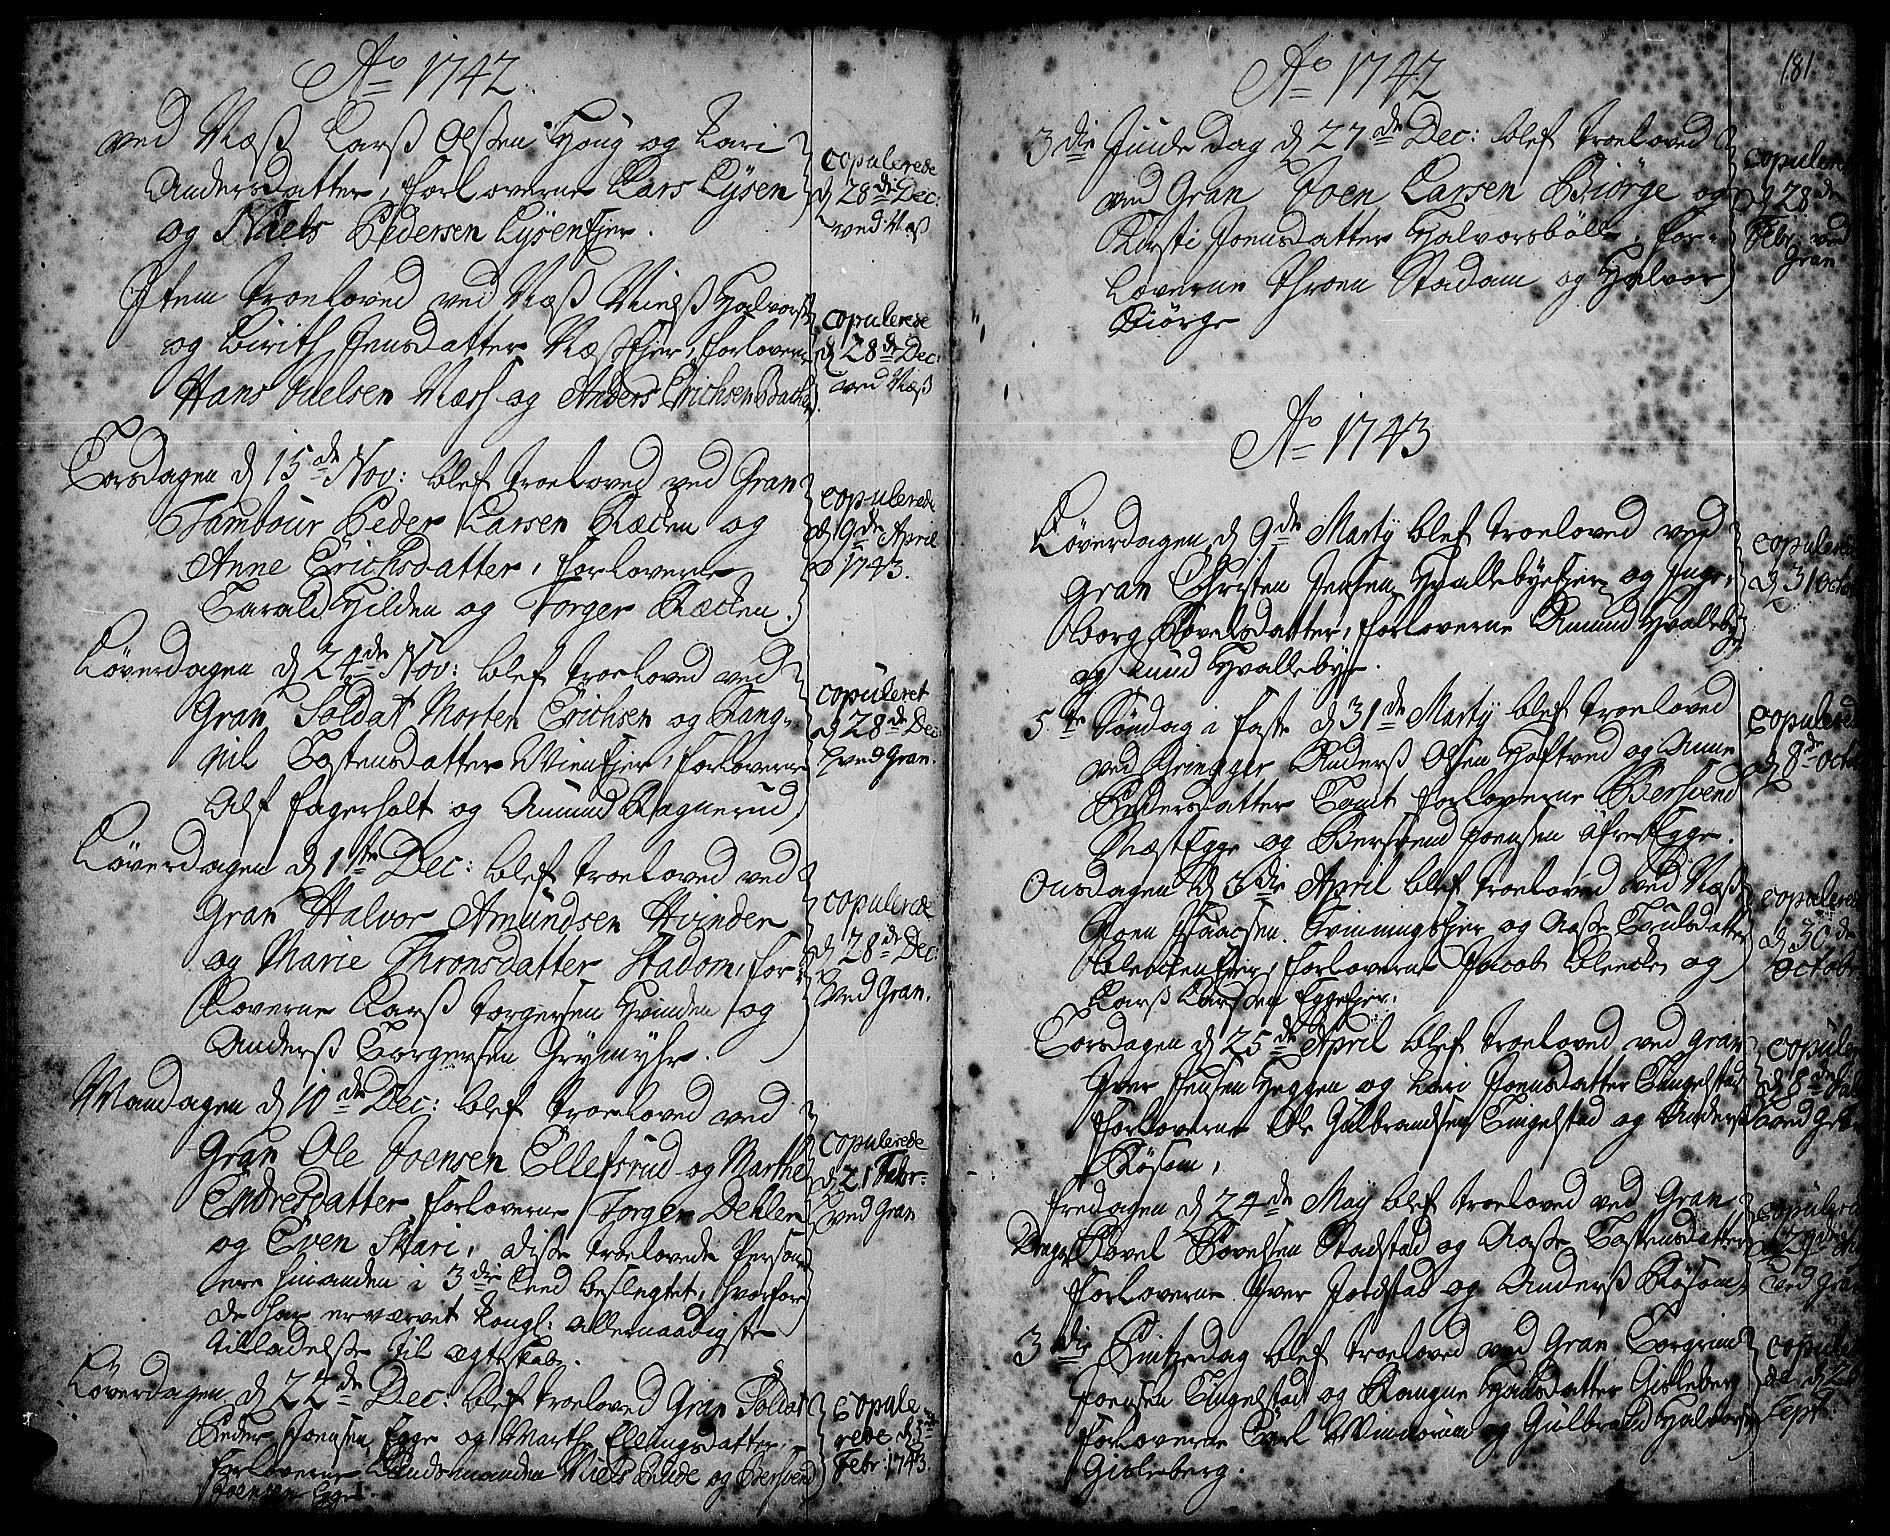 SAH, Gran prestekontor, Ministerialbok nr. 2, 1732-1744, s. 181